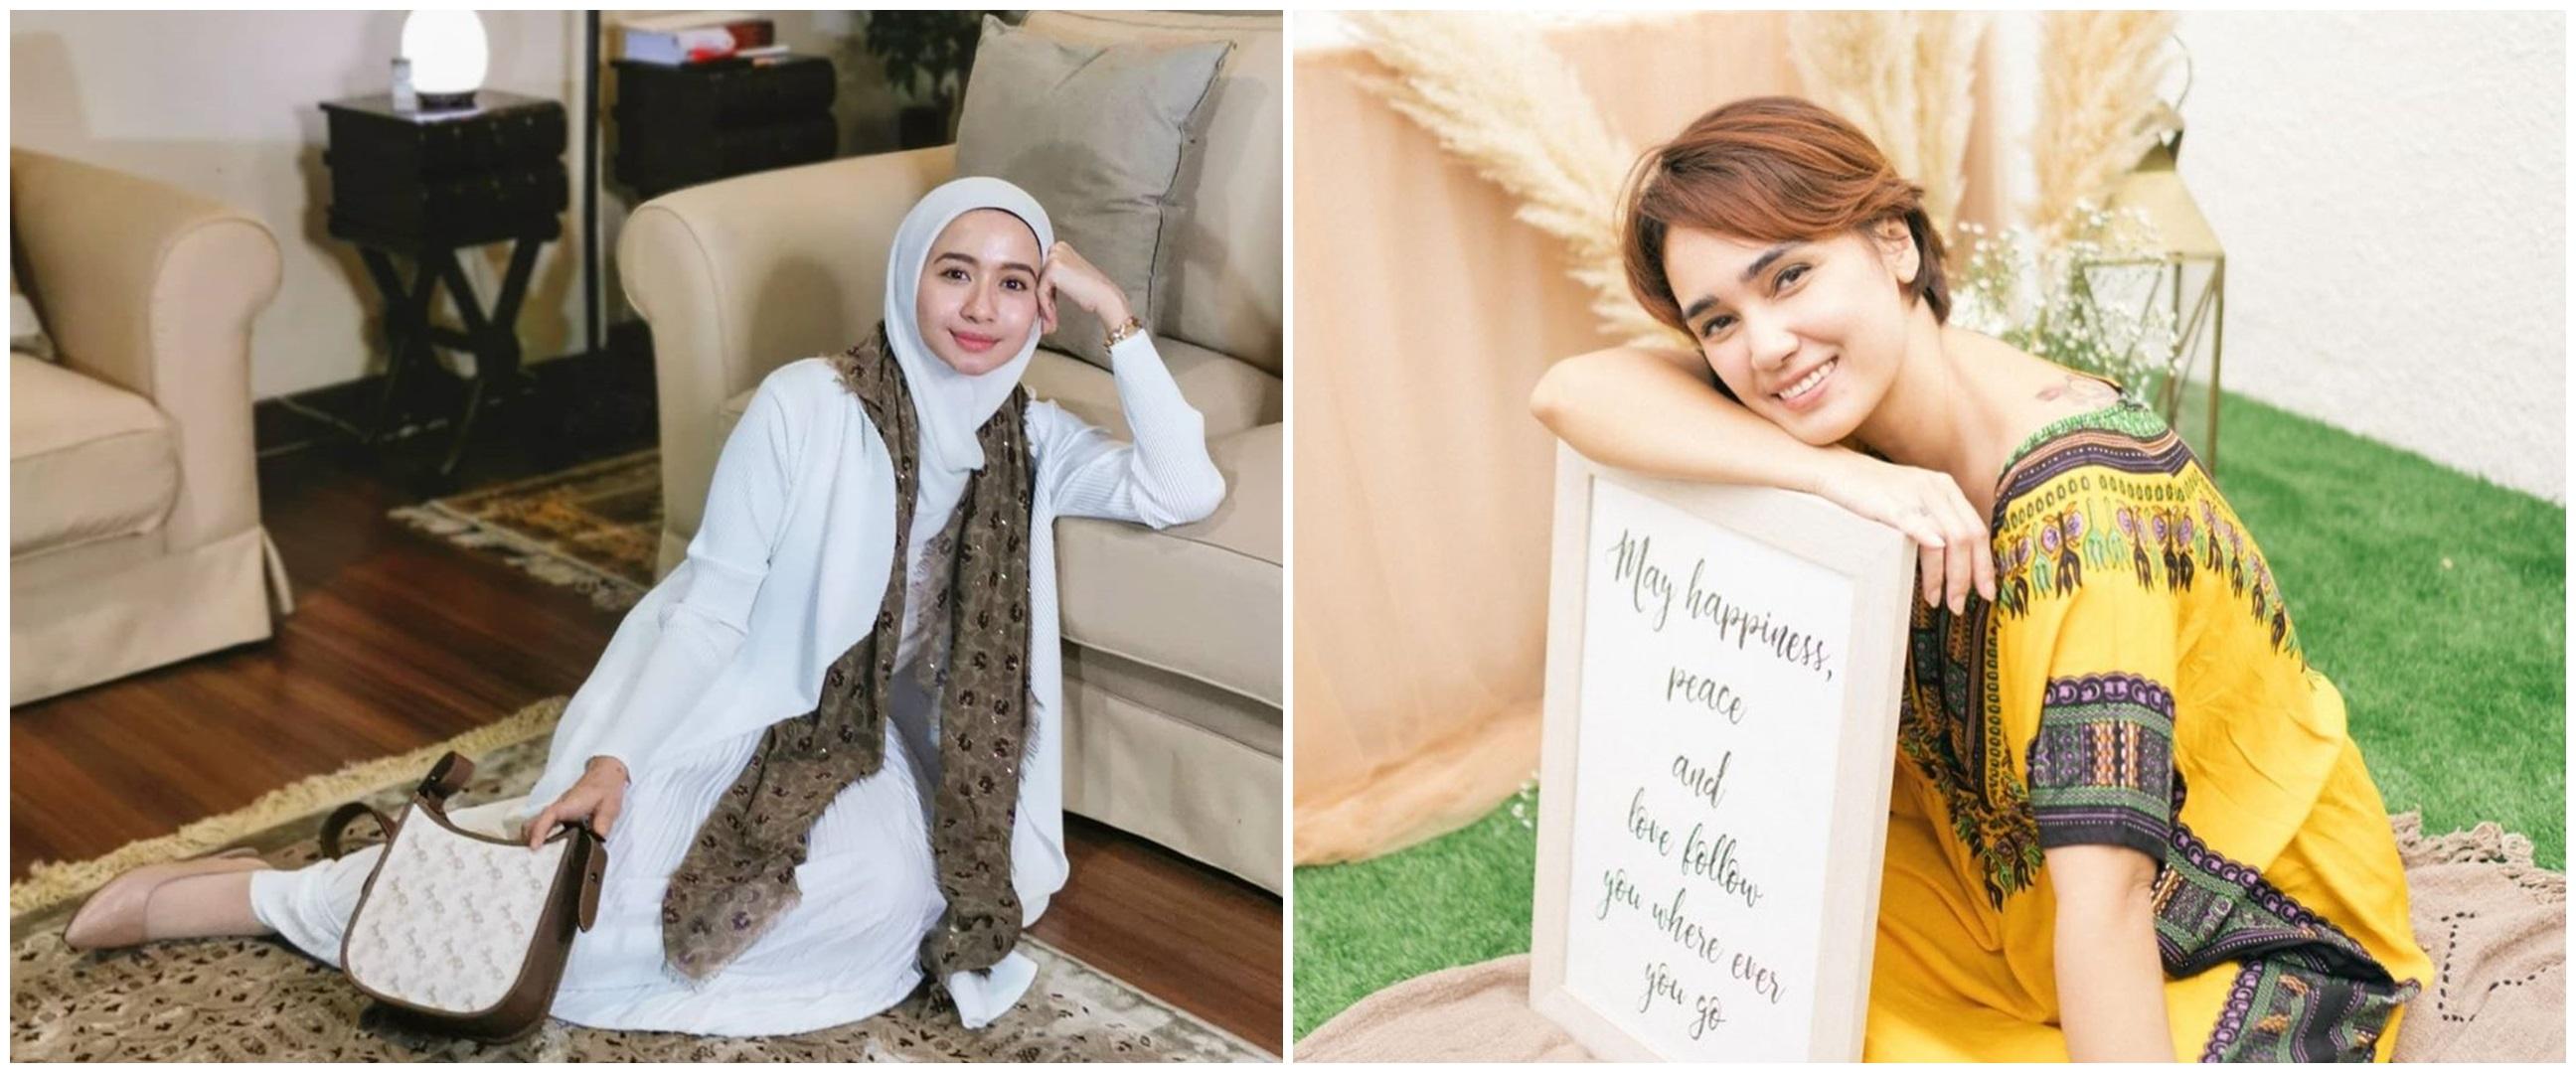 Menikah dengan WNA, pernikahan 7 seleb ini berakhir cerai